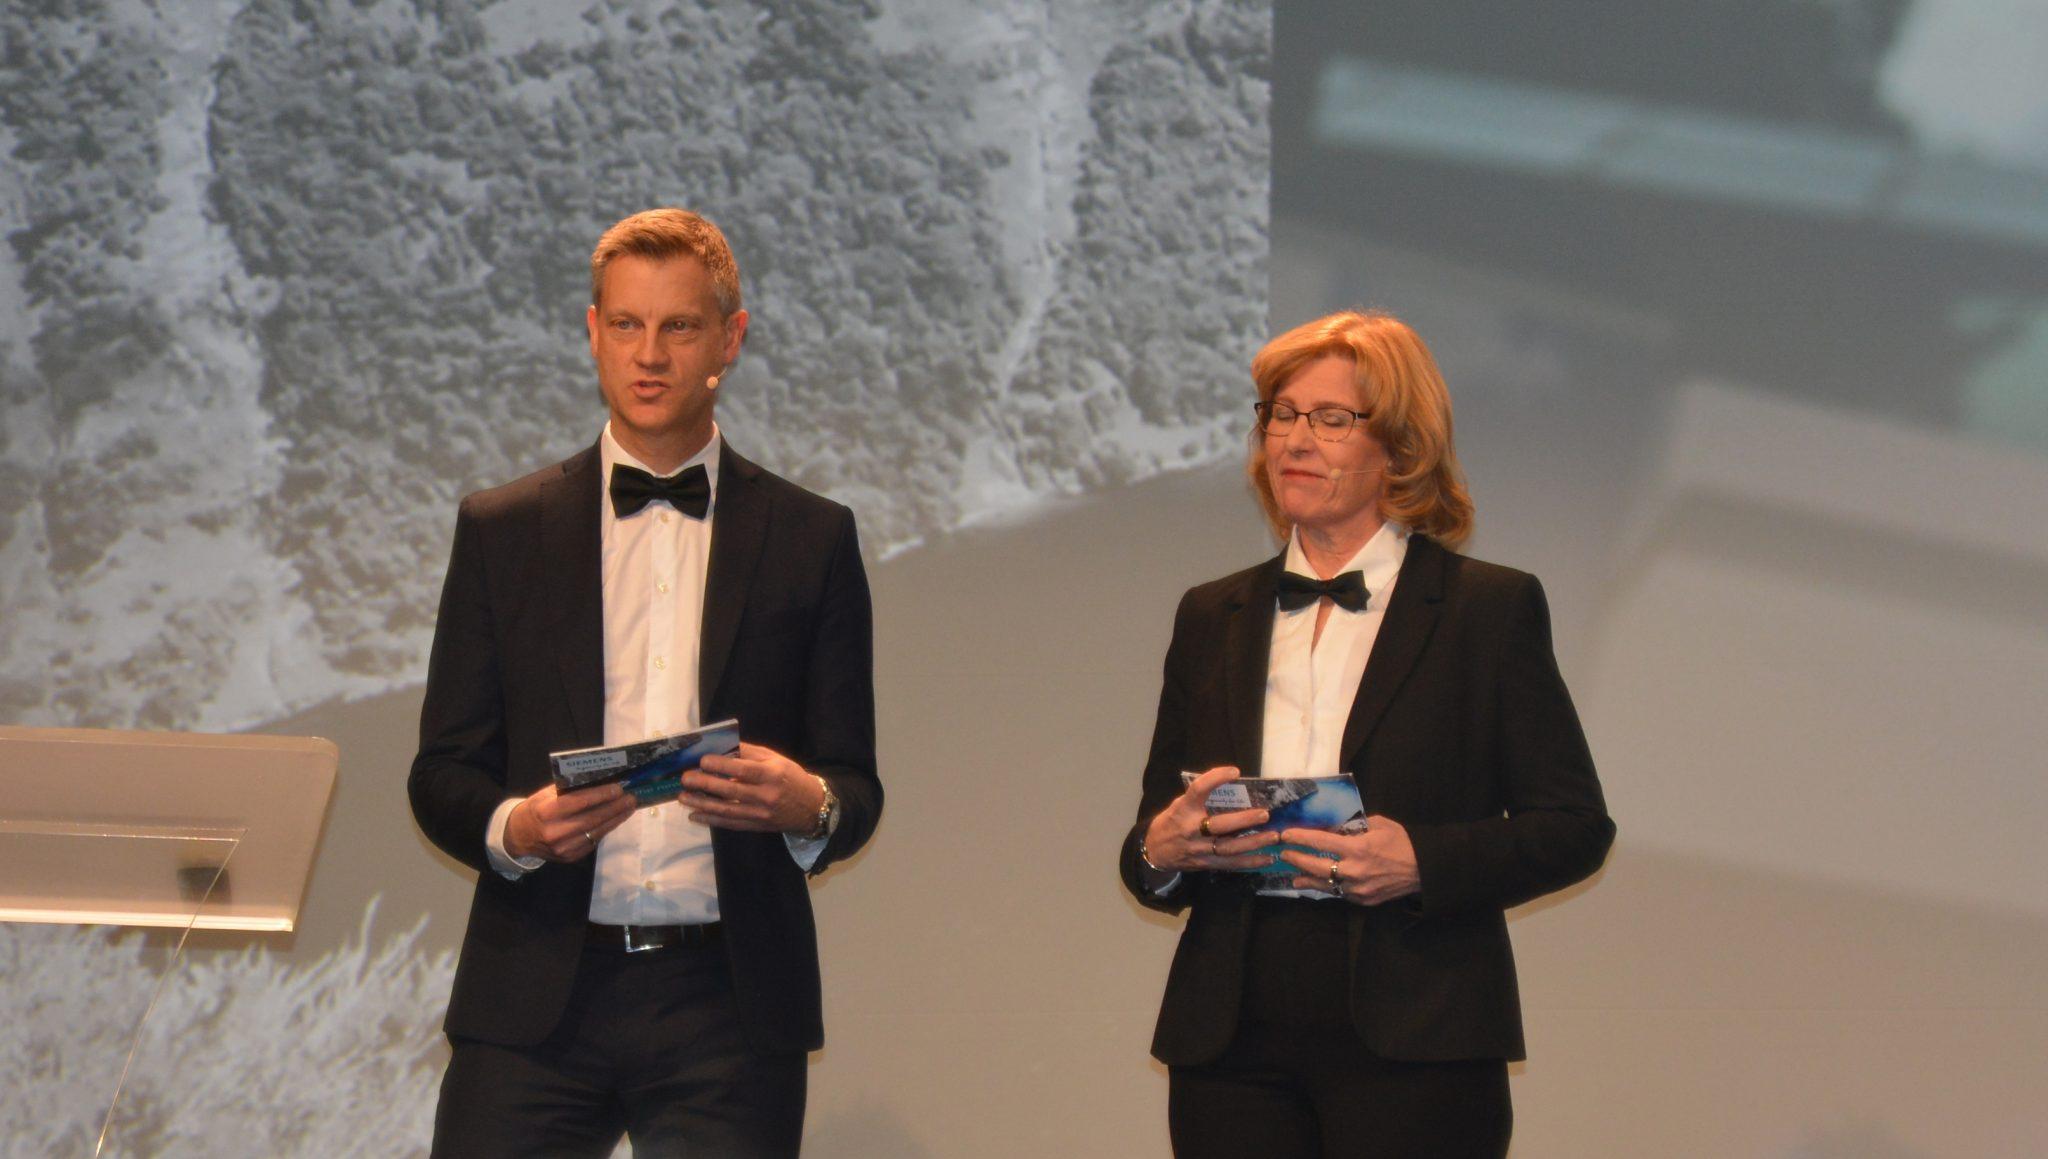 Bjørn Einar Brath og Anne Marit Panengstuen